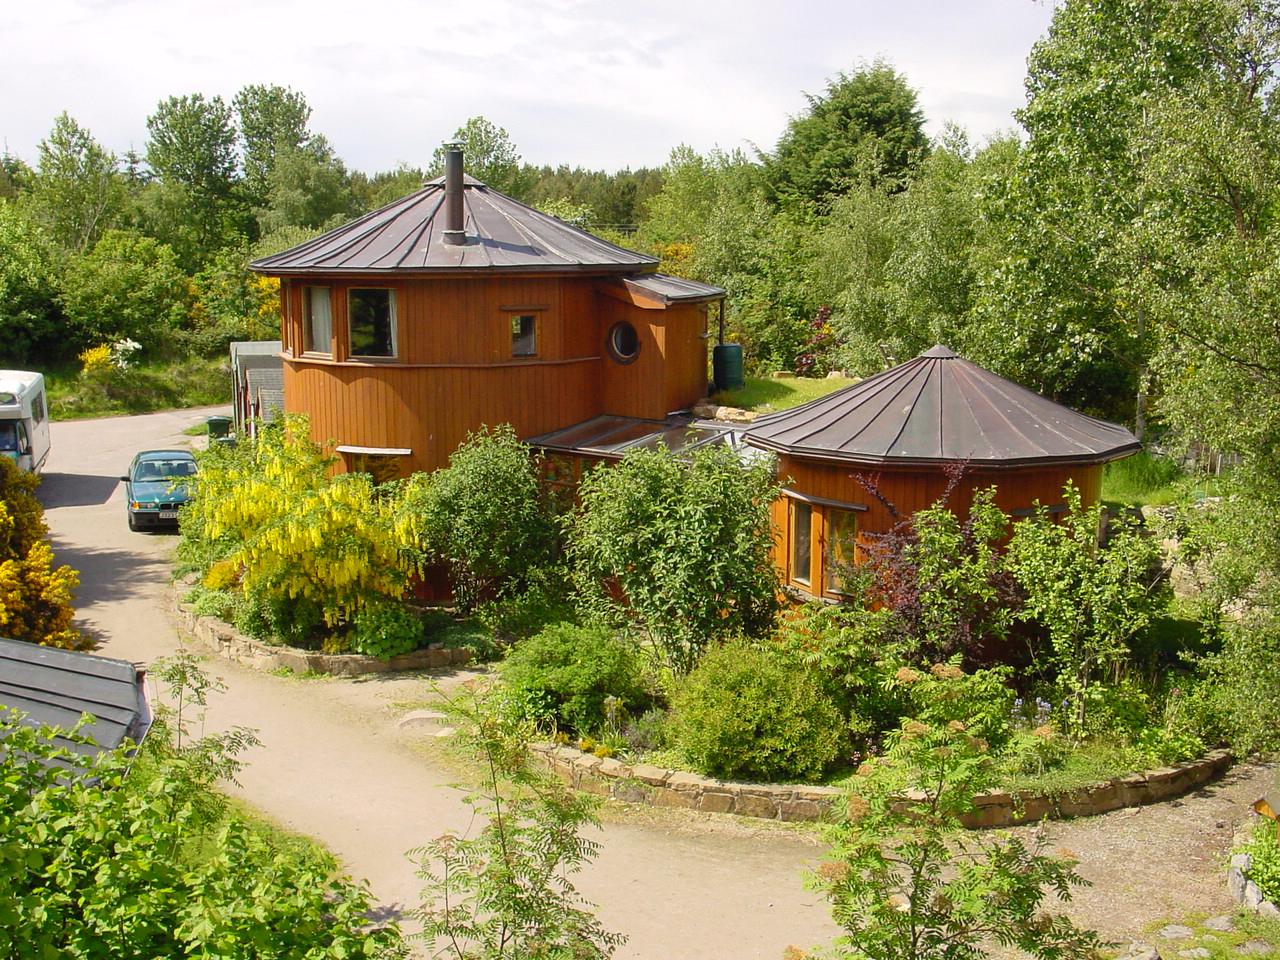 Scotland: Findhorn Ecovillageu0027s Whisky Barrel Houses | CNN Travel